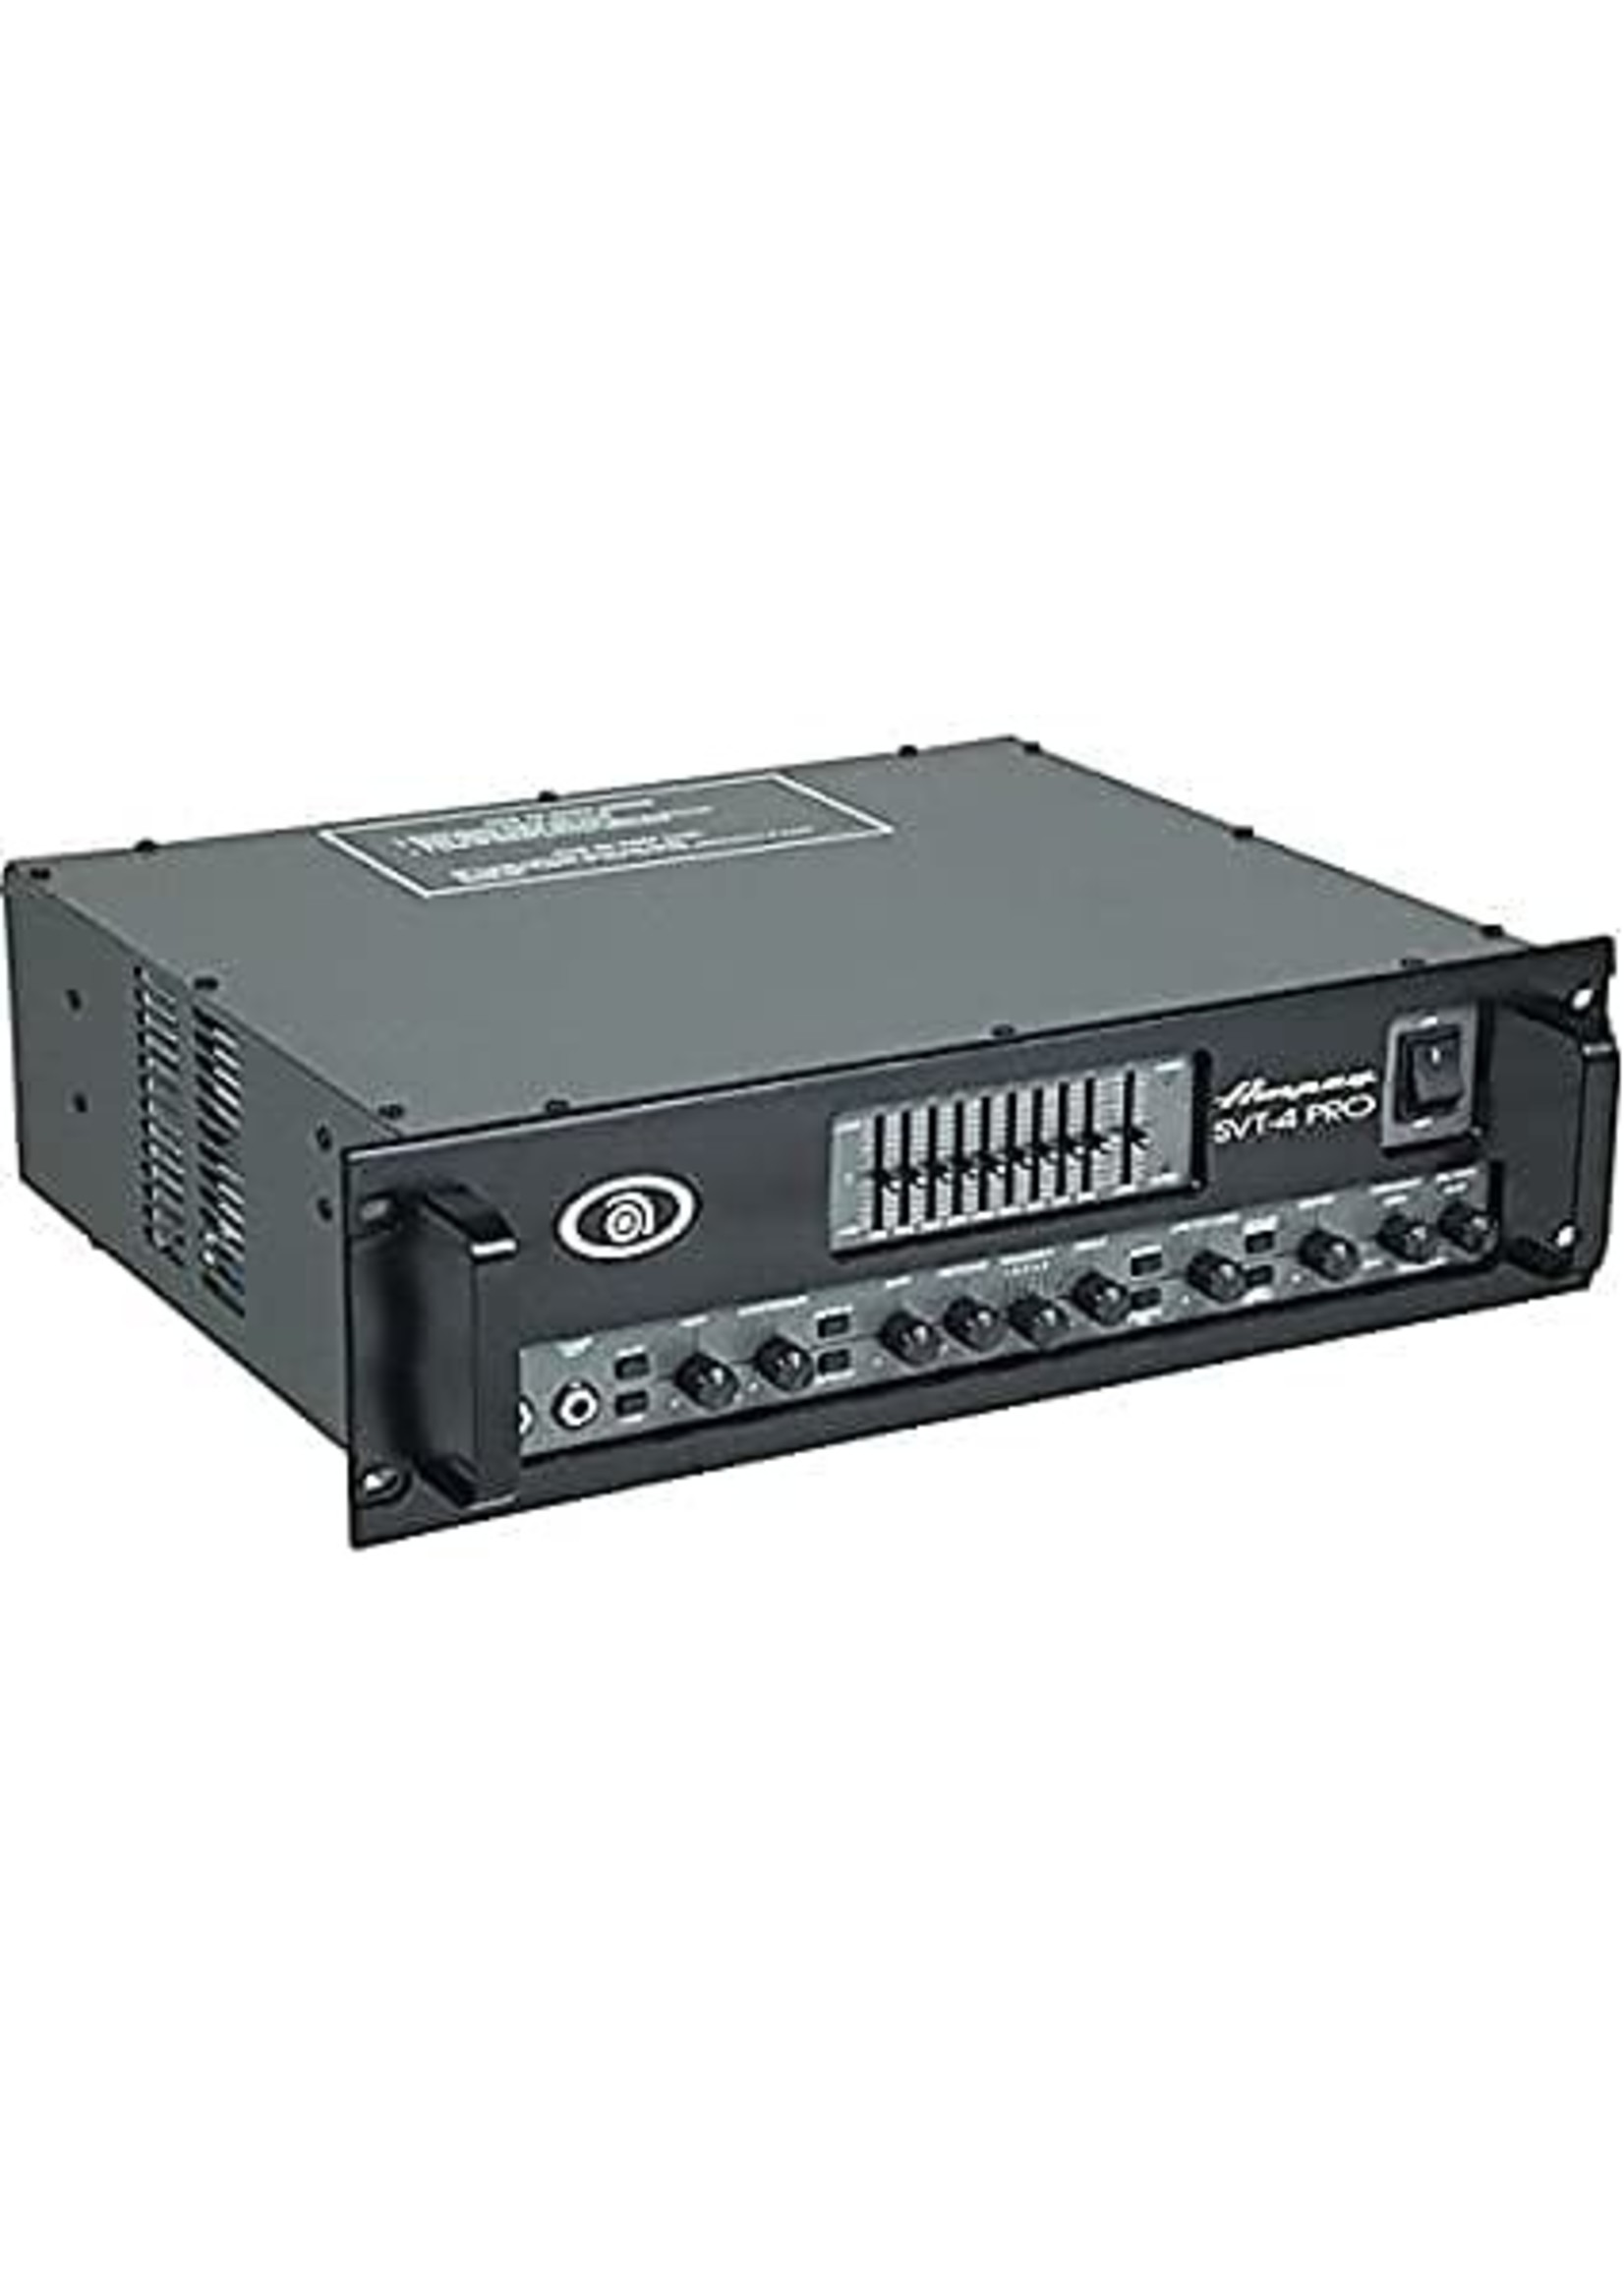 Ampeg Ampeg SVT-4PRO 1200-watt Tube Preamp Bass Head